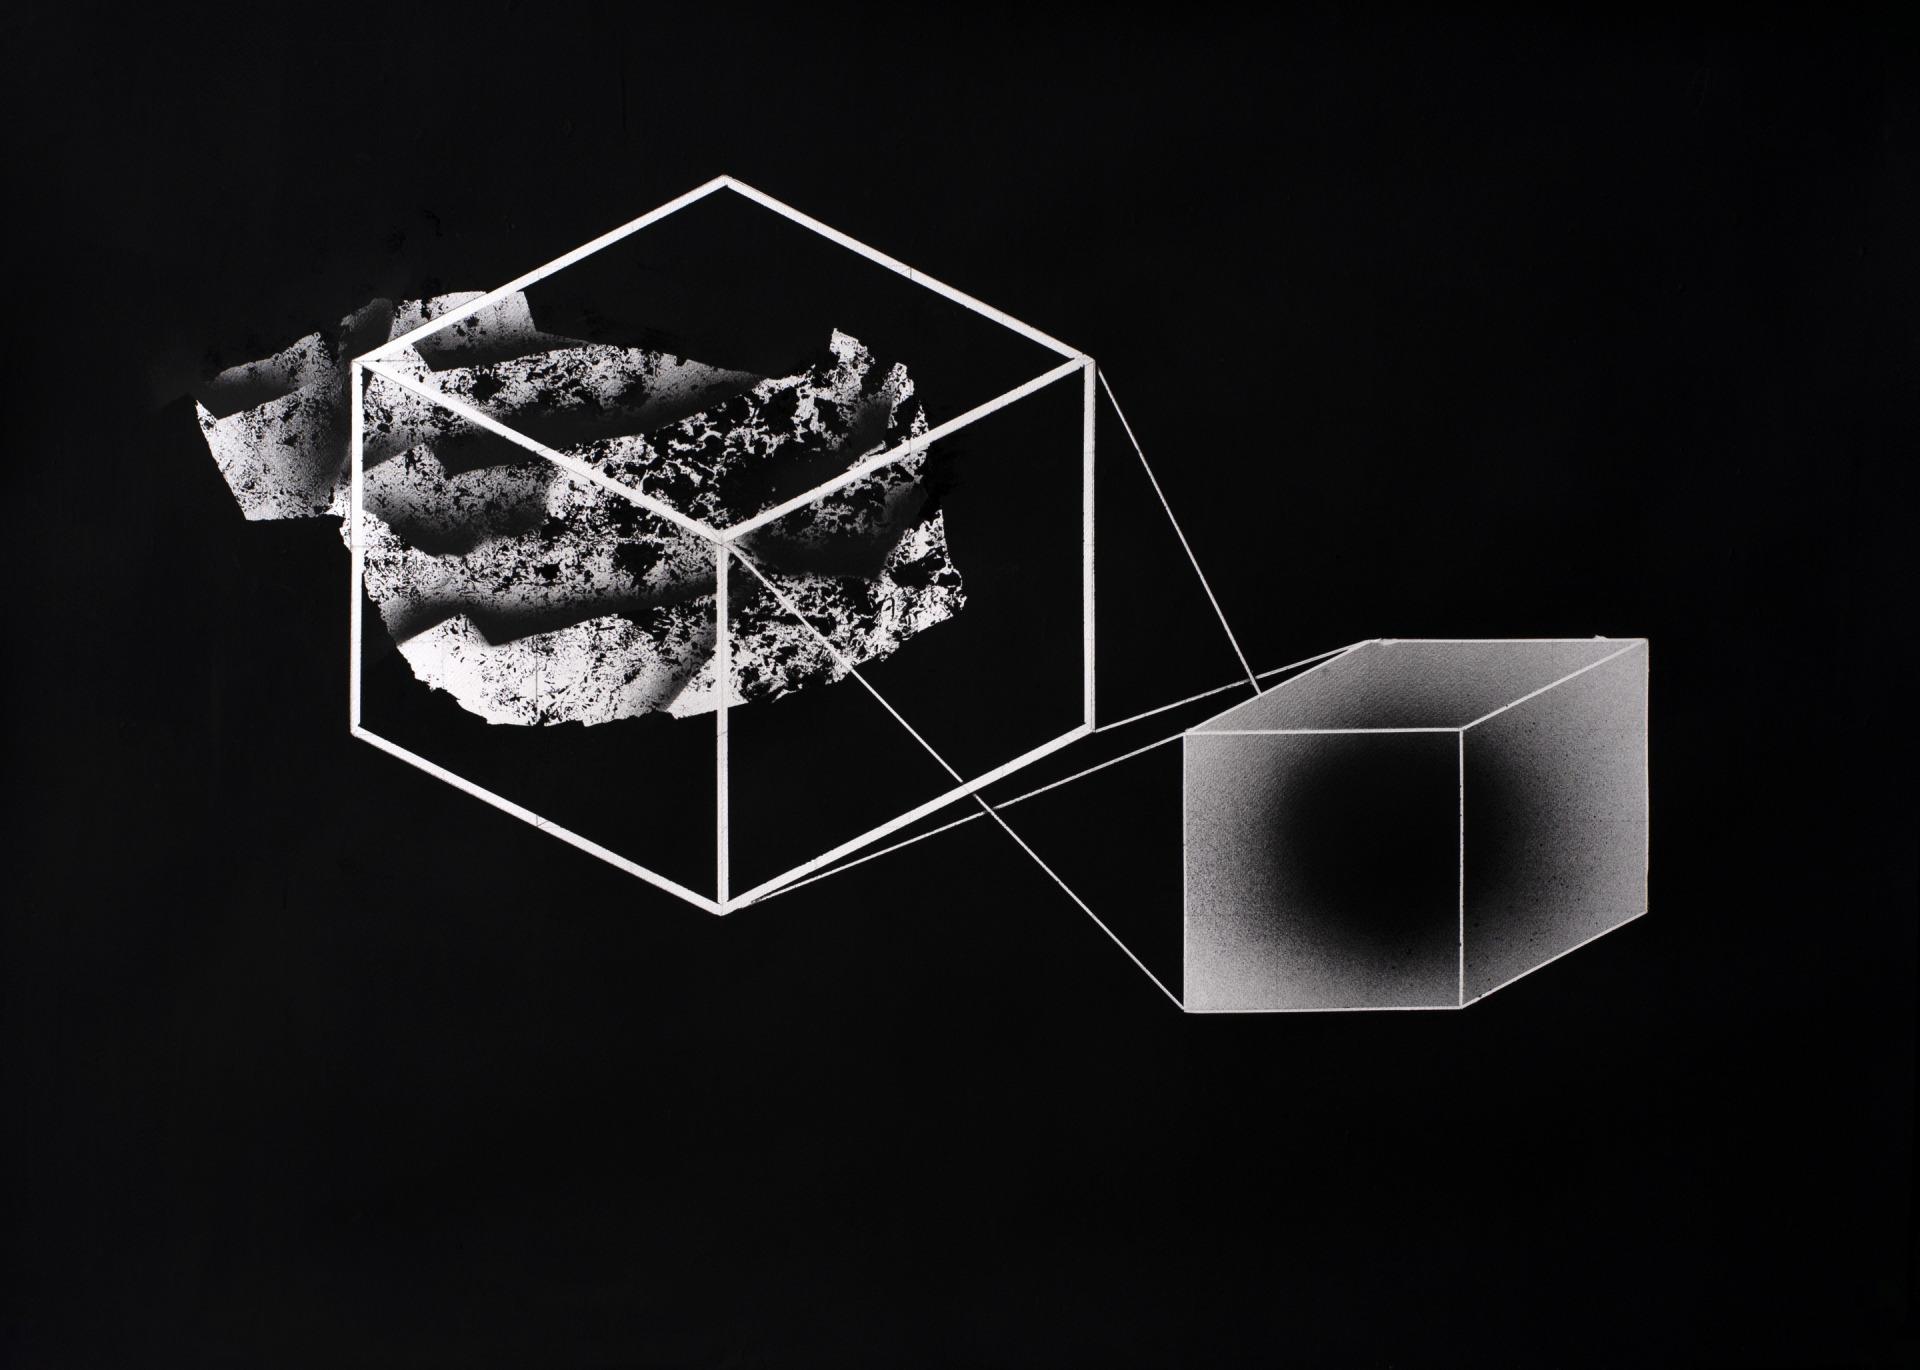 Contemporary art from Gyula Sági | op190321. 10